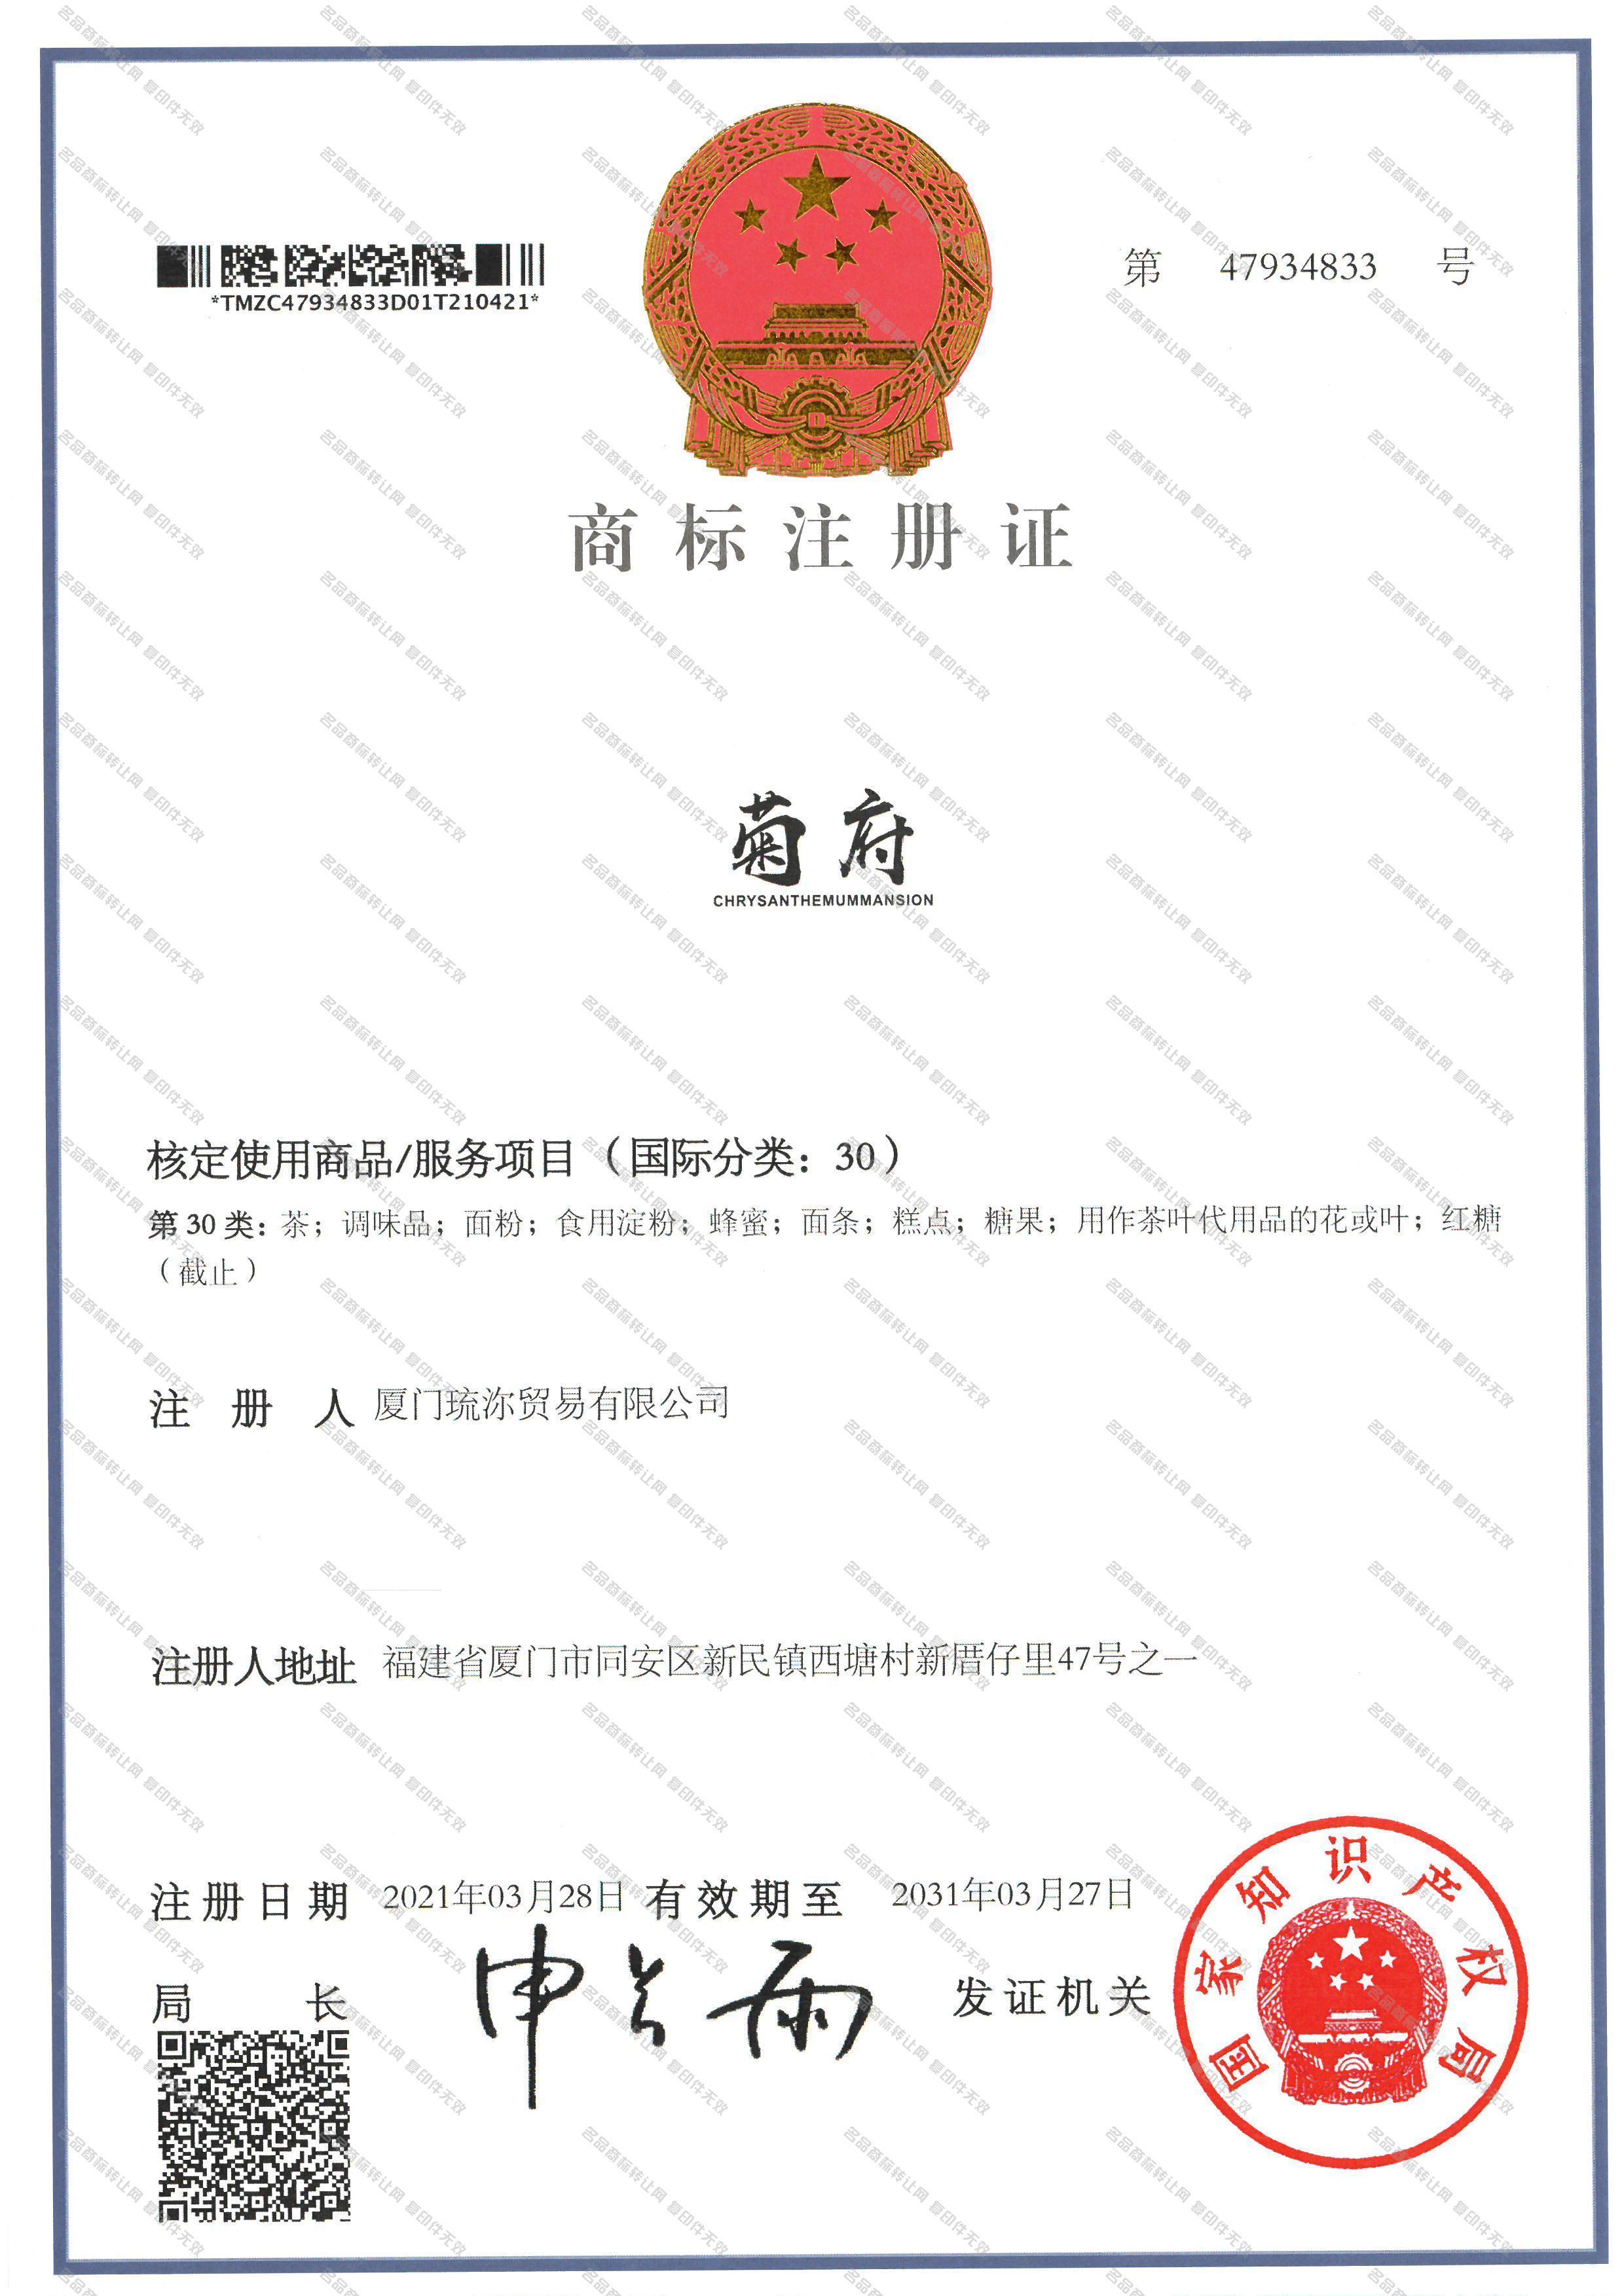 菊府 CHRYSANTHEMUMMANSION注册证